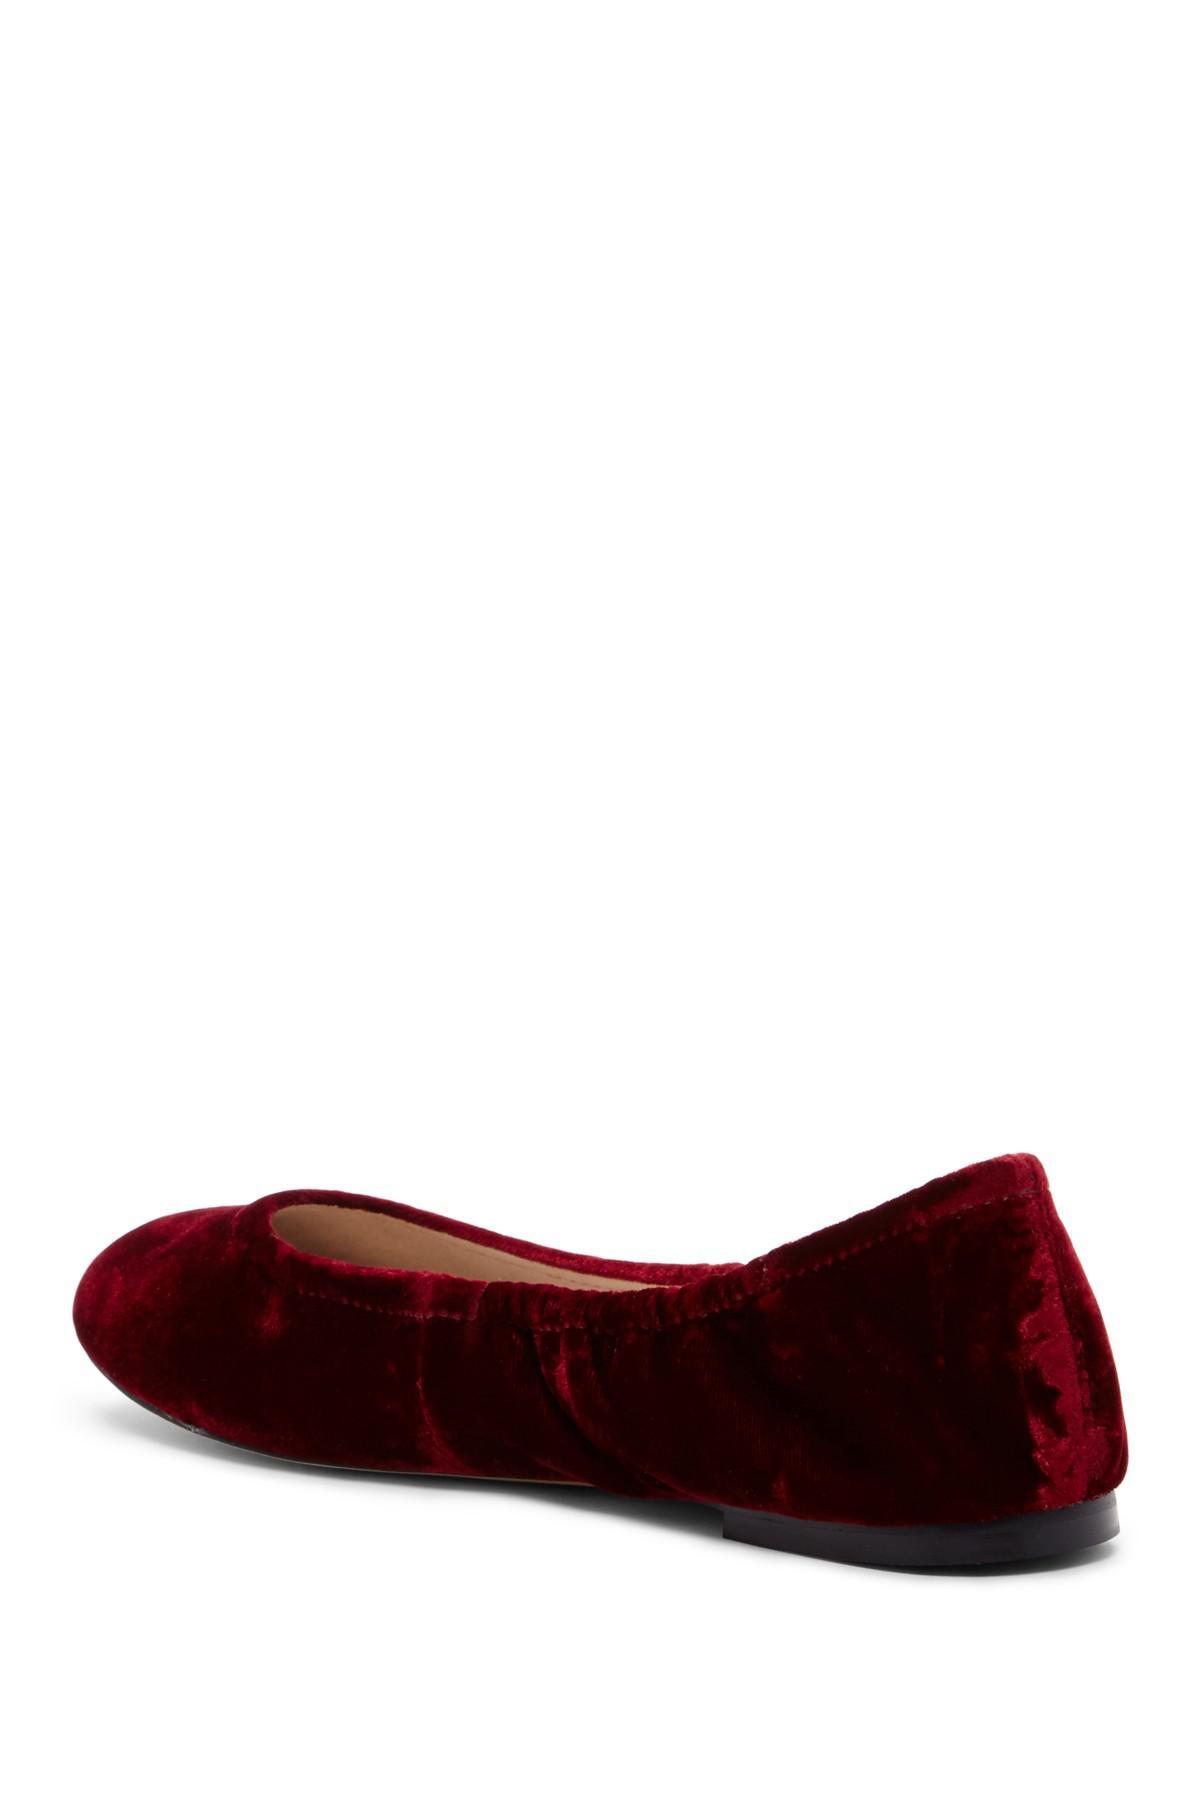 fd99c6dc639d9a Lyst - Sam Edelman Fritz Velvet Ballet Flat in Red